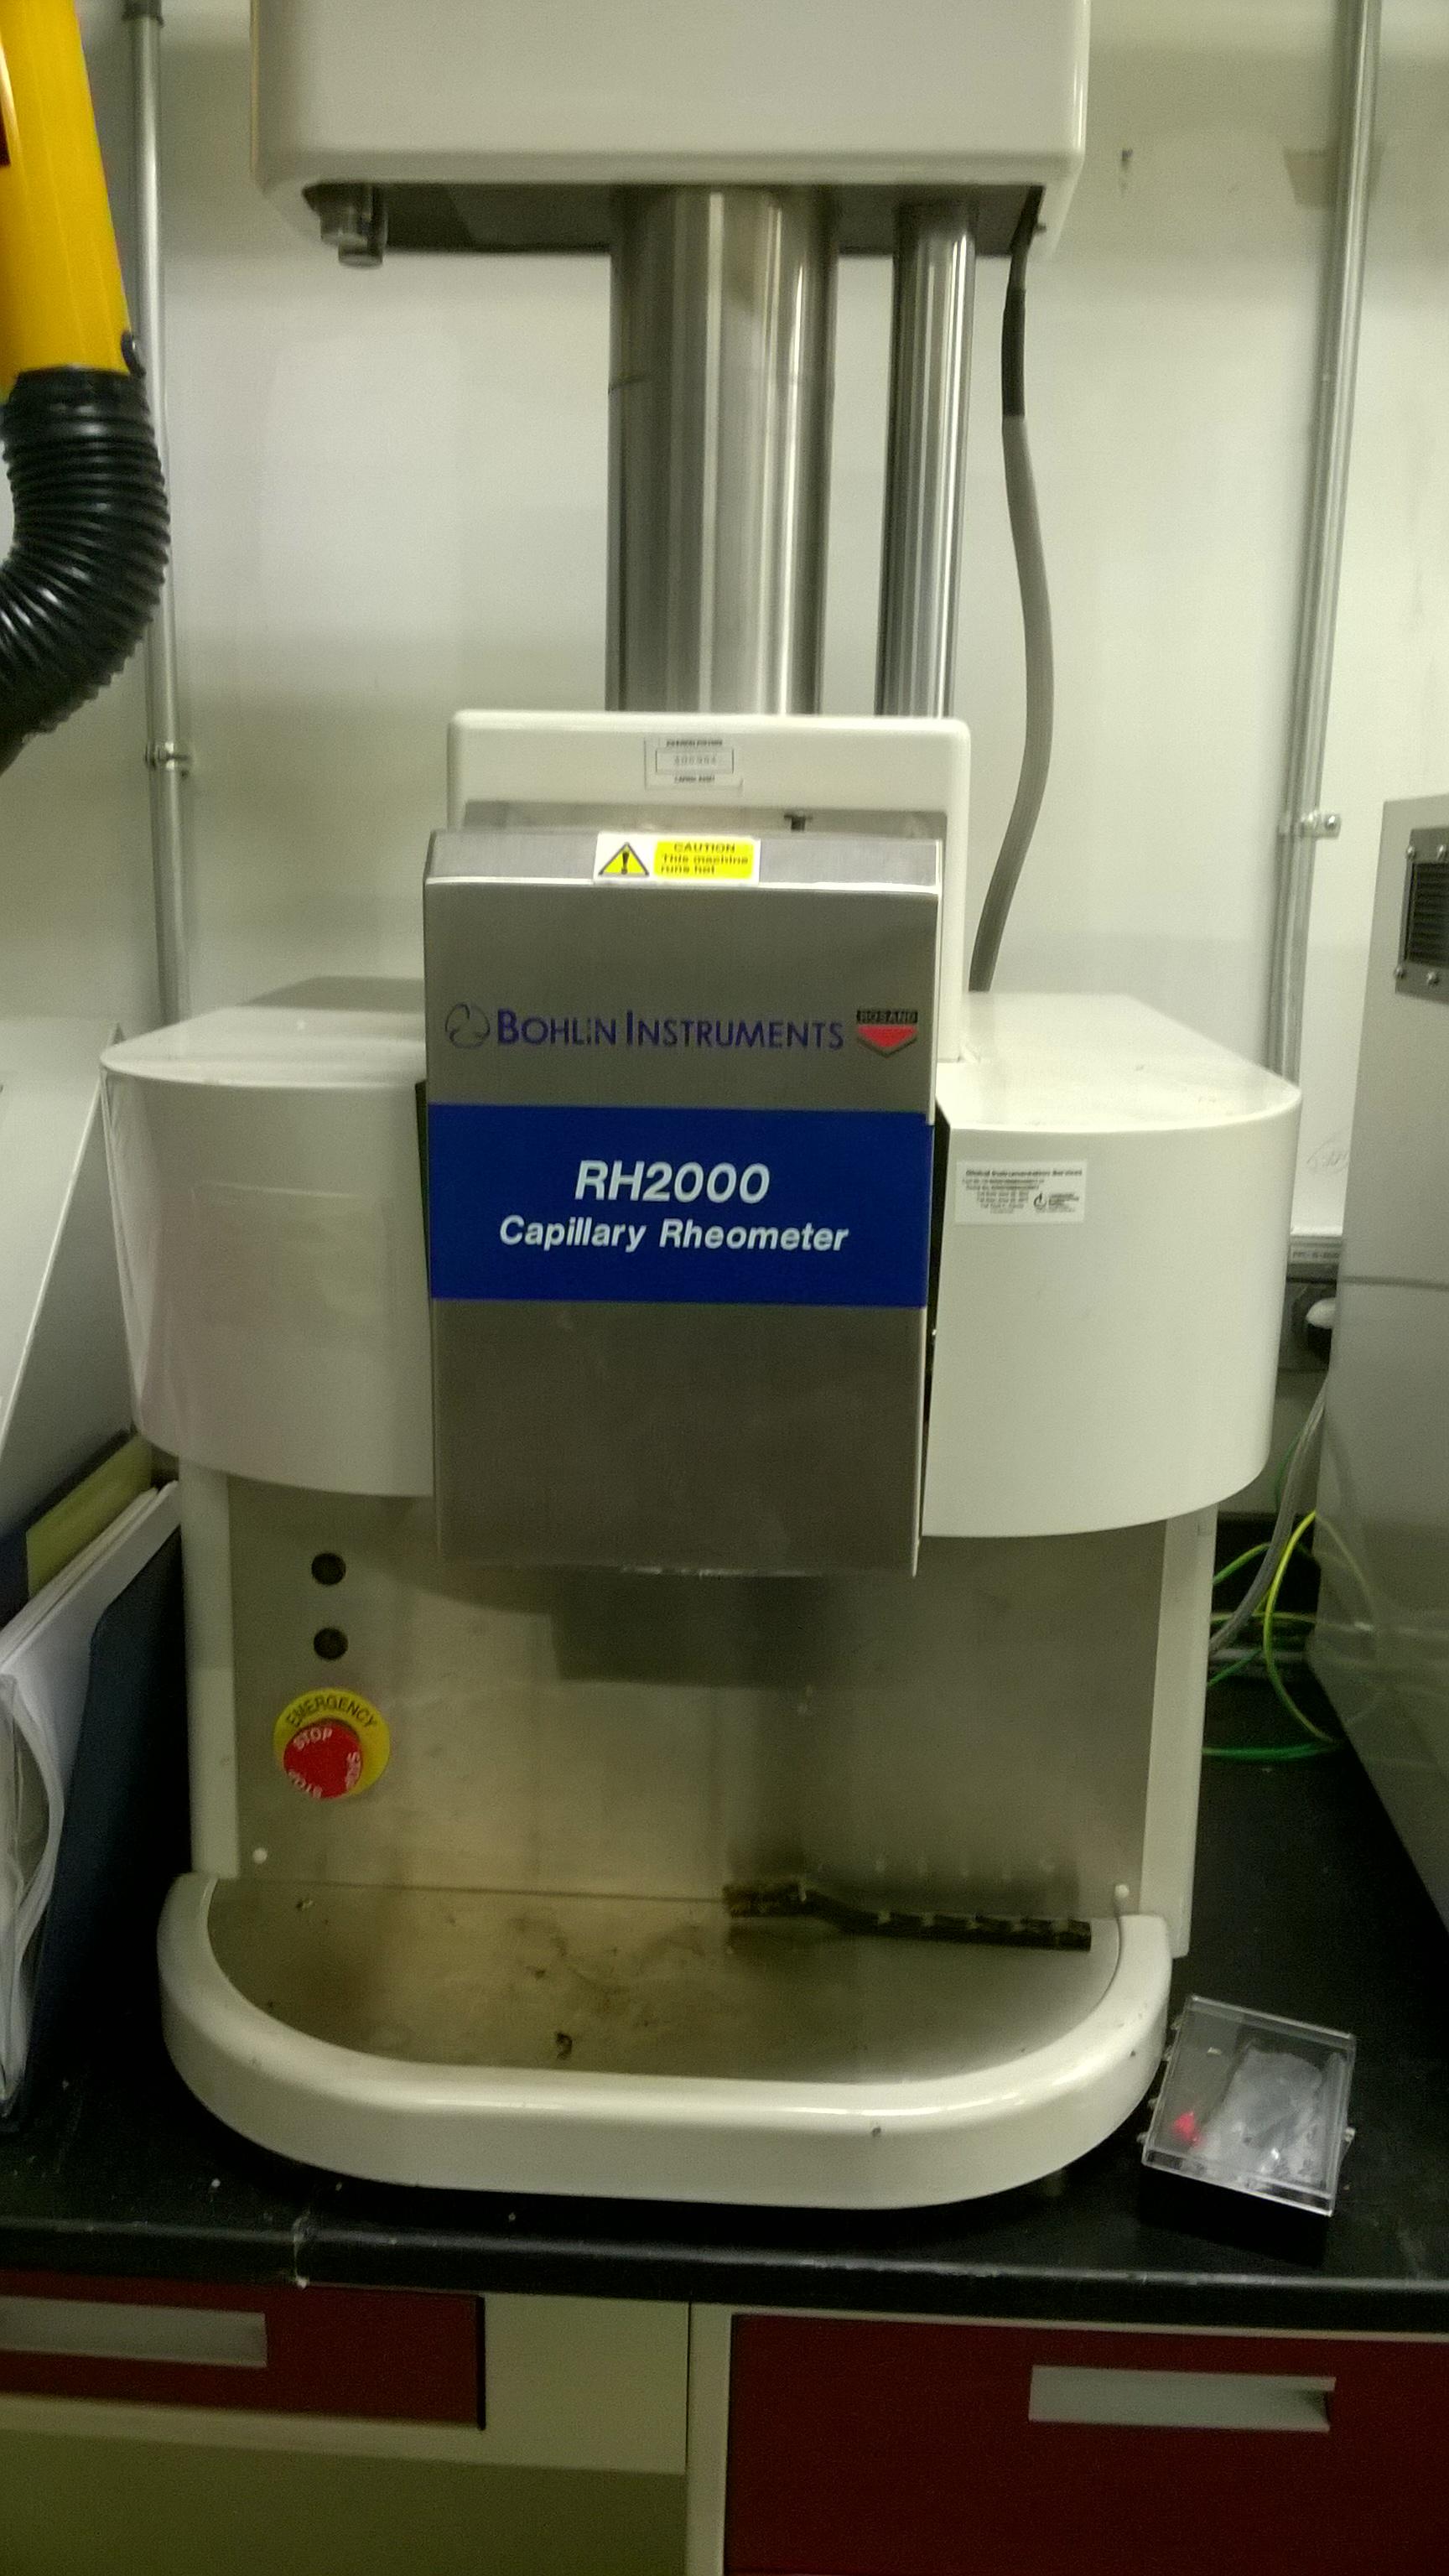 Bohlin RH2000 Capillary Rheometer